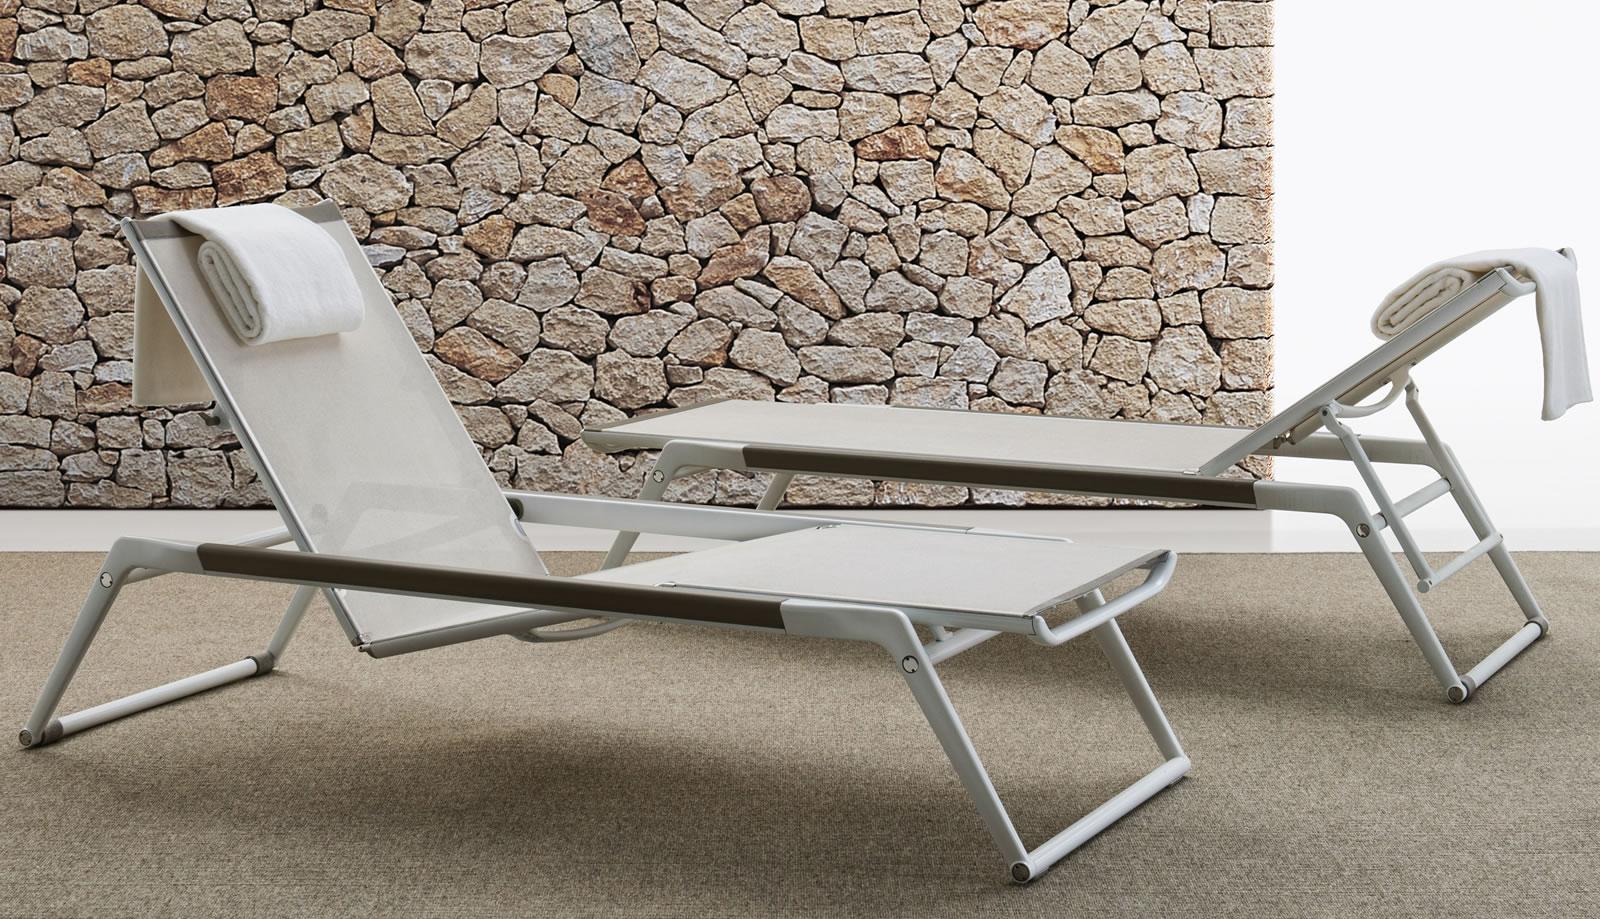 mirto outdoor b b italia mirto outdoor b b italia sunlounger outdoor mirto outdoor b b. Black Bedroom Furniture Sets. Home Design Ideas